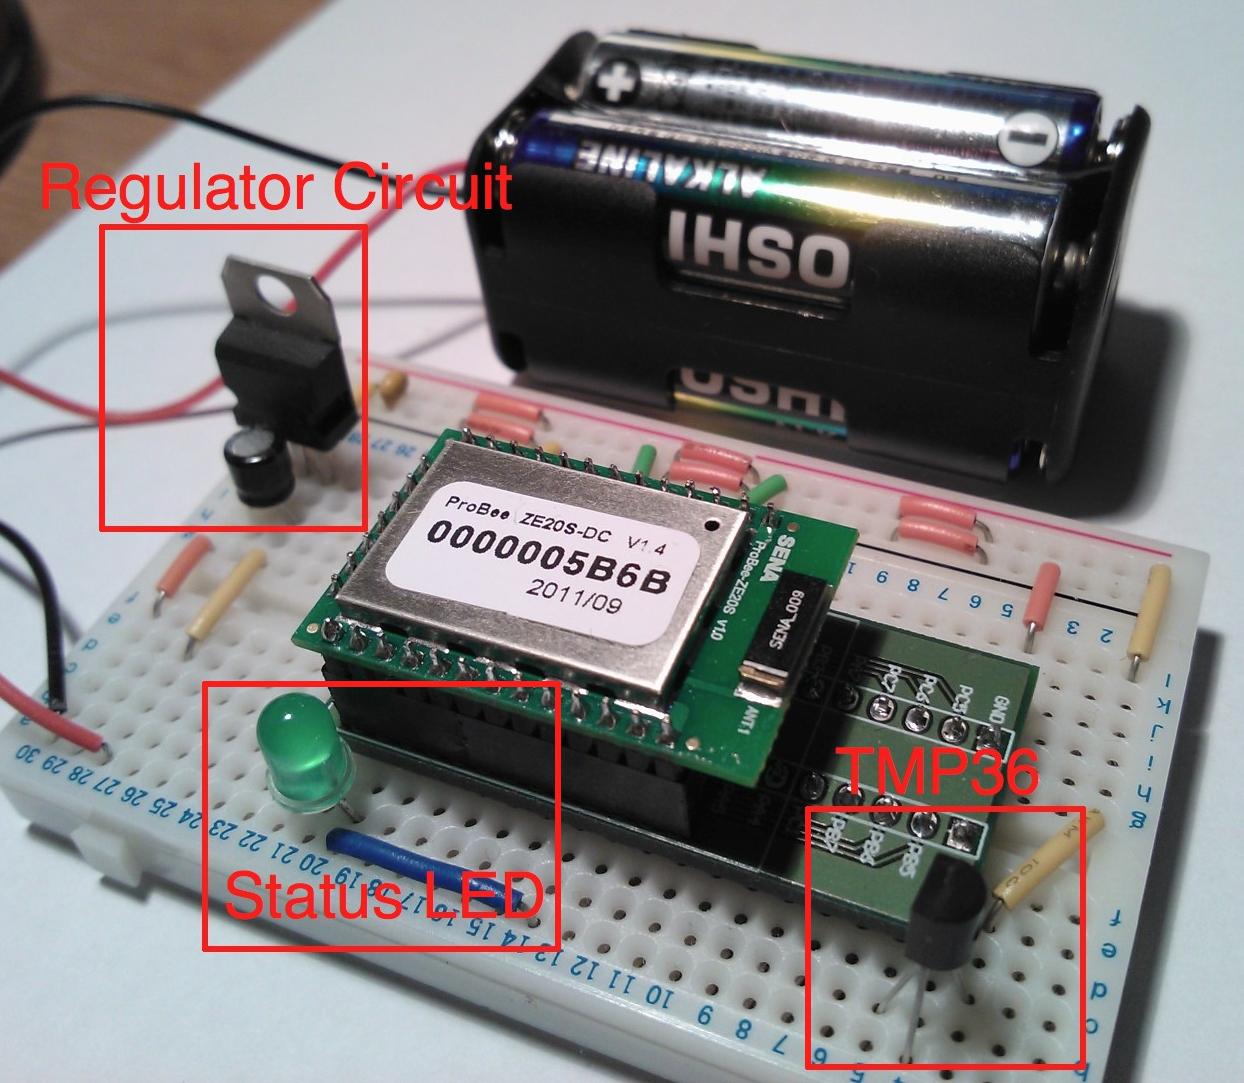 Arduino zigbee and embedded development probee based